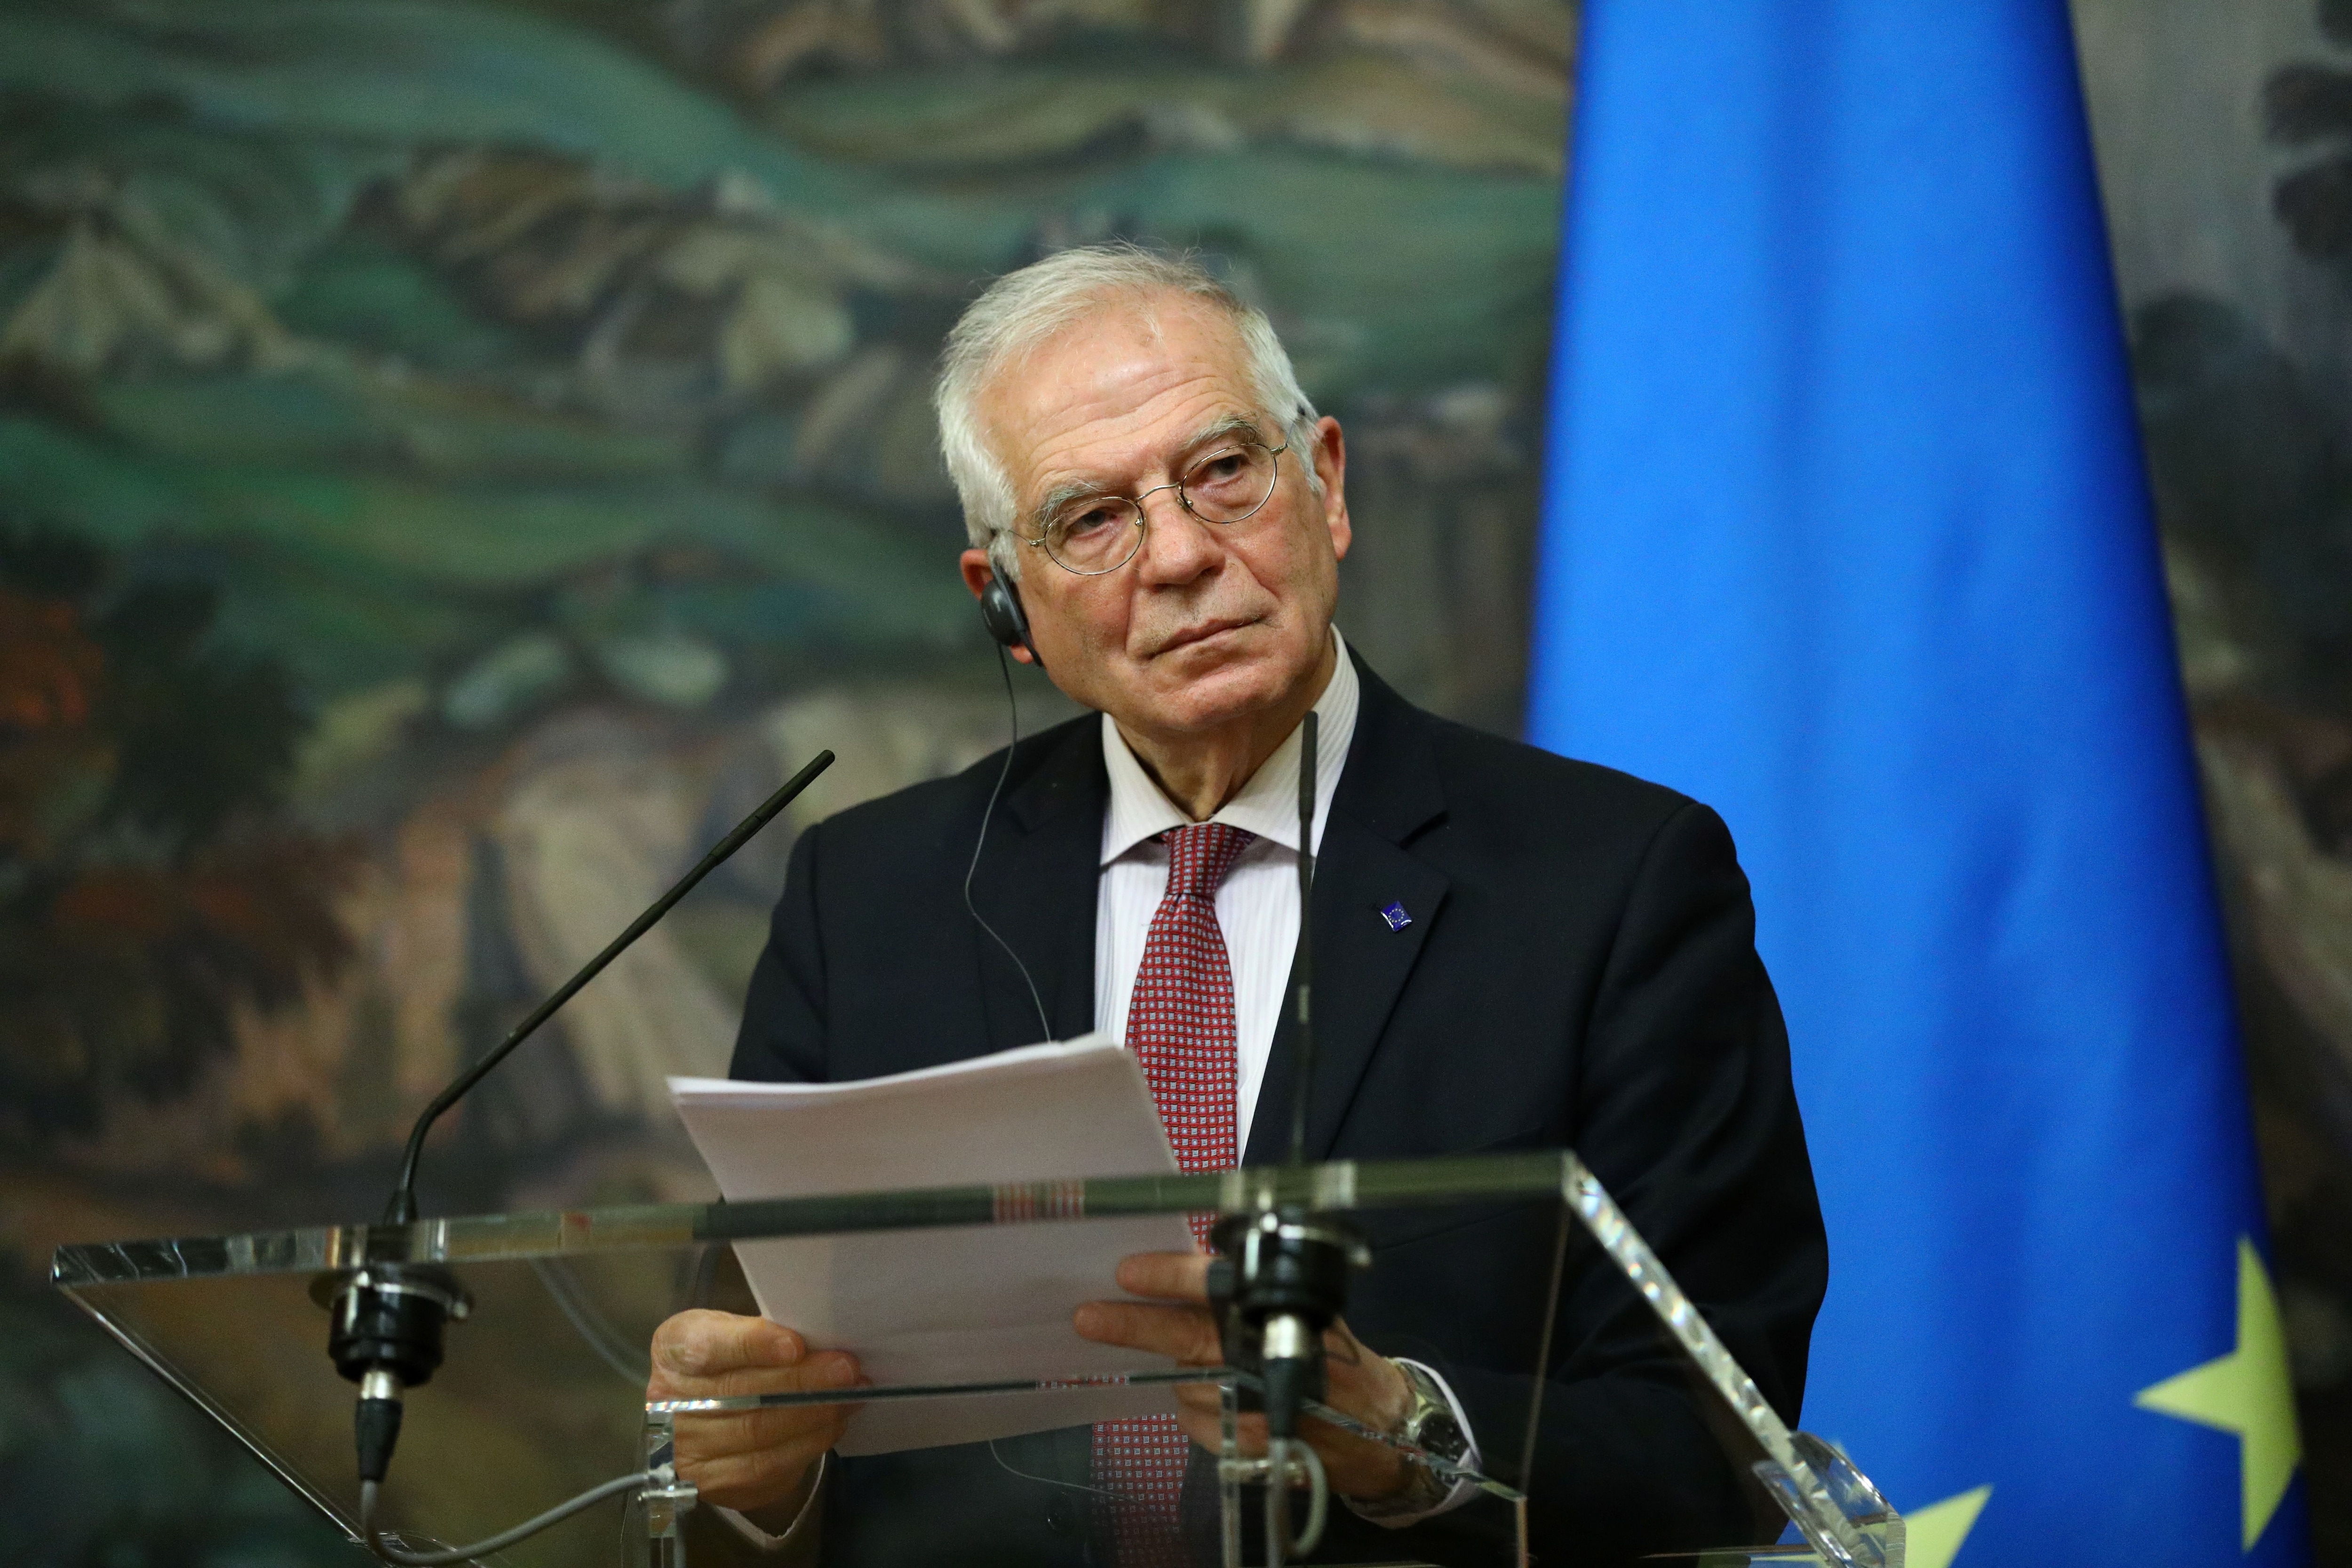 El jefe de la diplomacia europea, Josep Borrell, en una conferencia de prensa tras su gira en Moscú. Russian Foreign Ministry/Handout via REUTERS